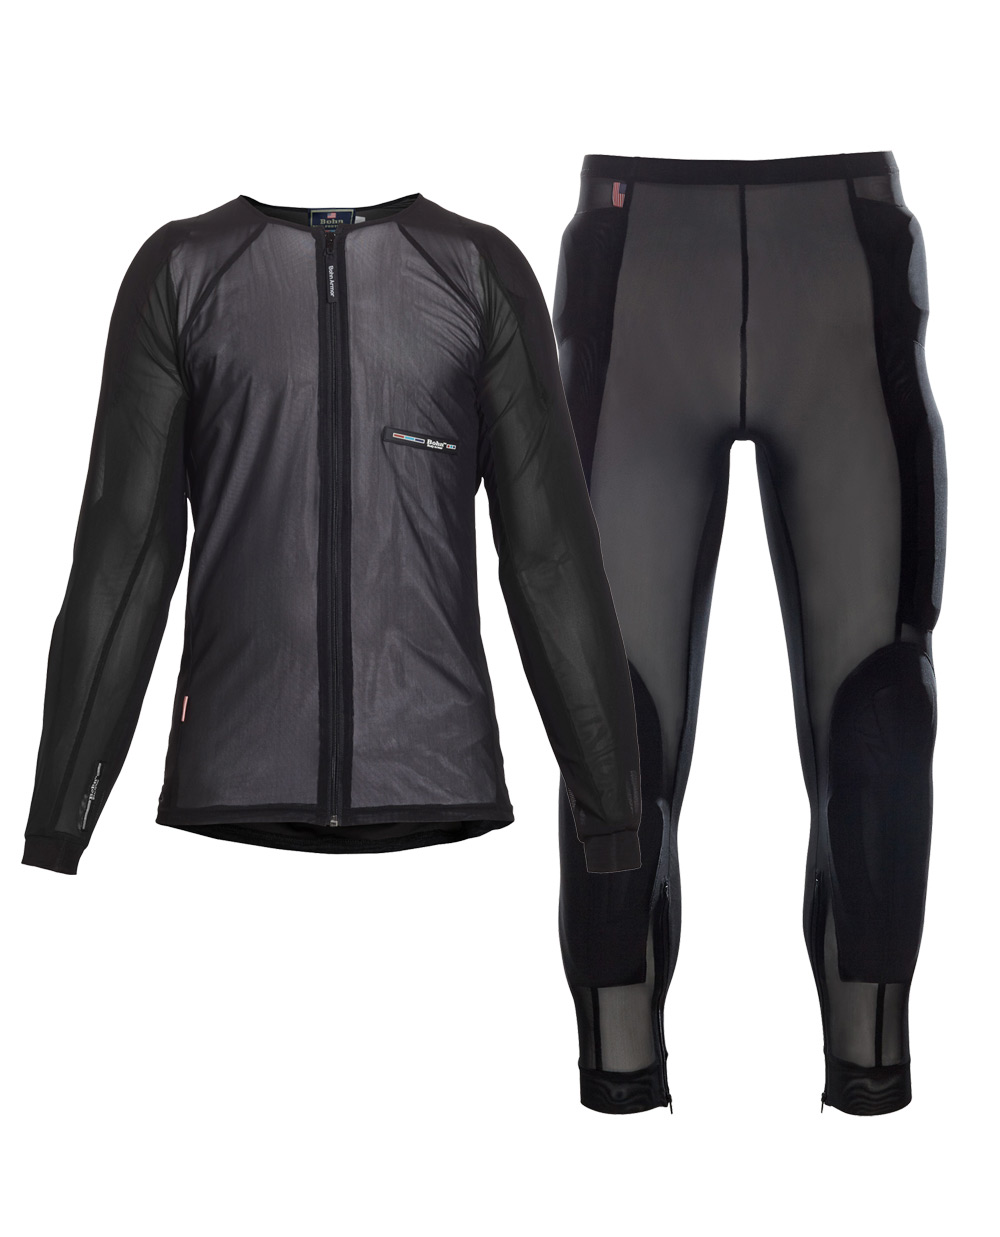 71cff5a7b1dc Cool-Air Combo Motorcycle Riding Shirt and Pants